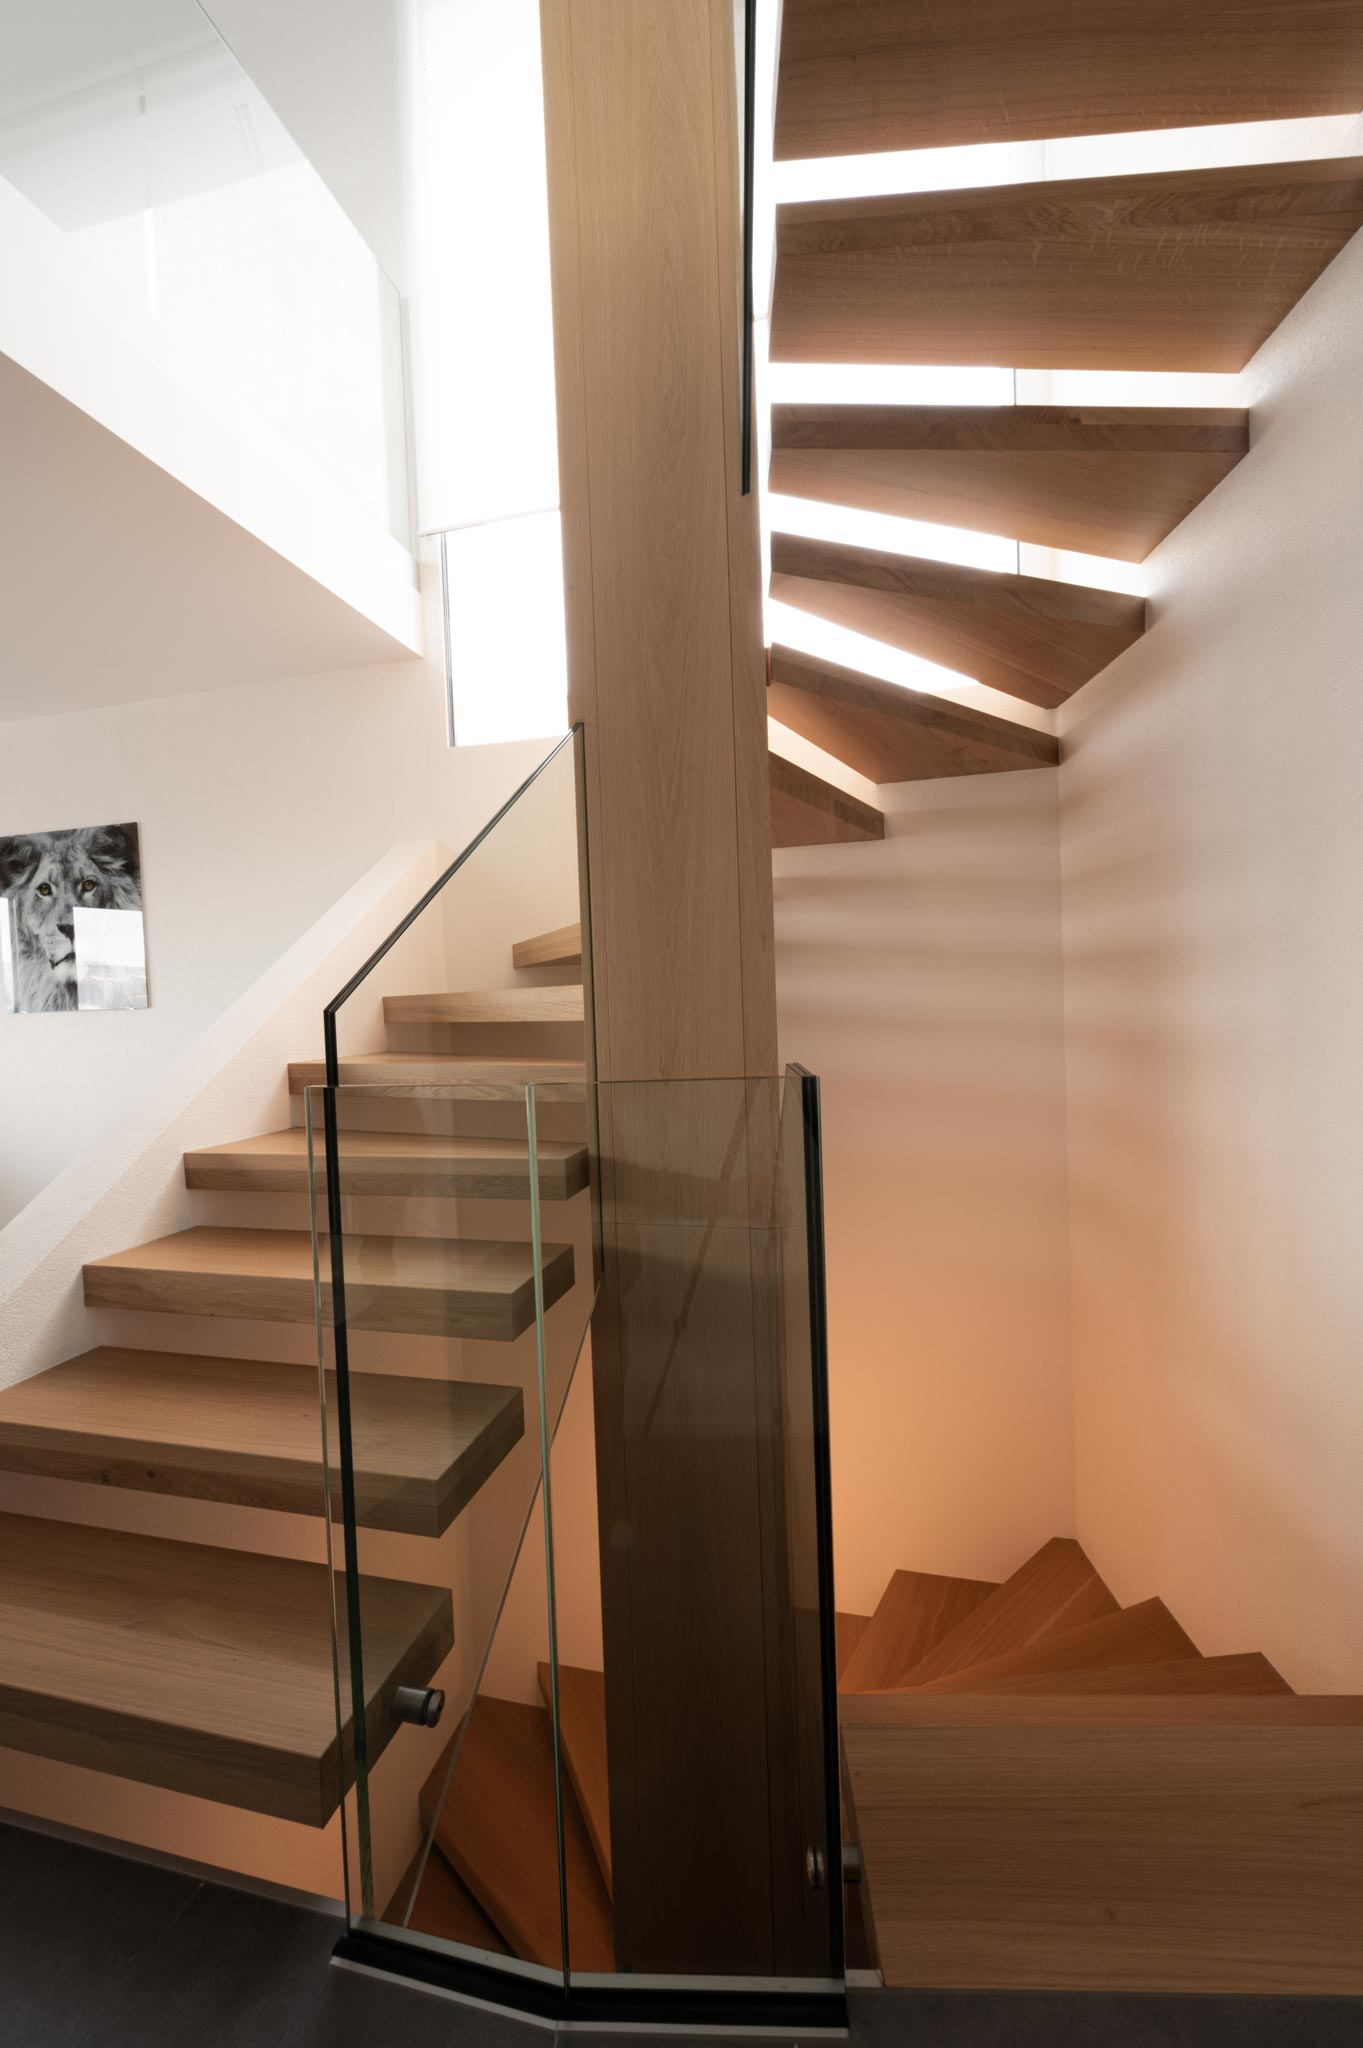 ES Gin 7697 escalier vtc 21 01 0013 - Escalier à Cheyres (GJ)